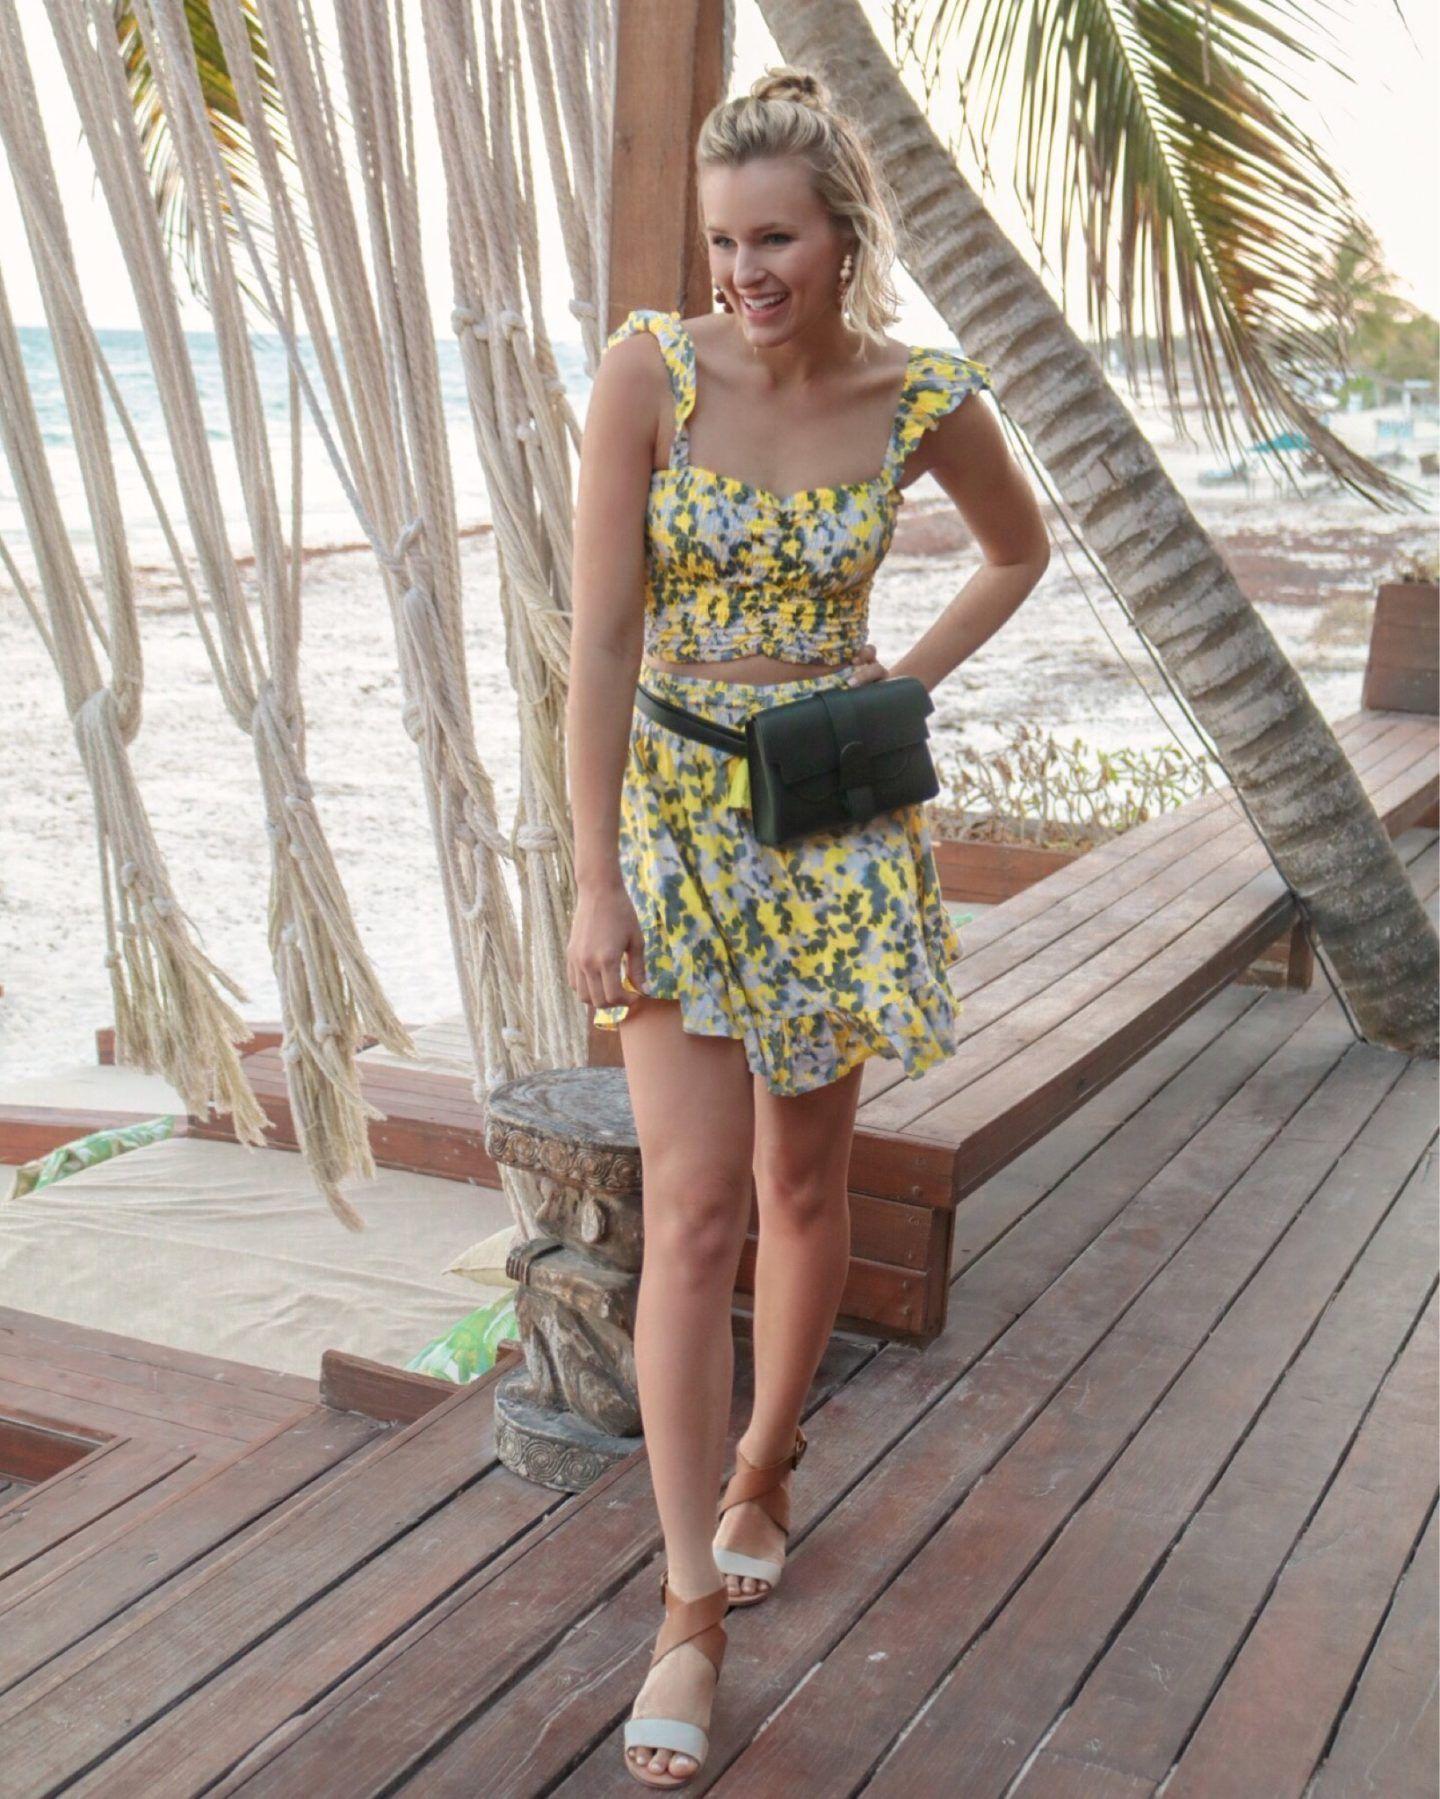 Amber Carlisle Porn 282 best travel images in 2020 | travel, my travel, dubai travel